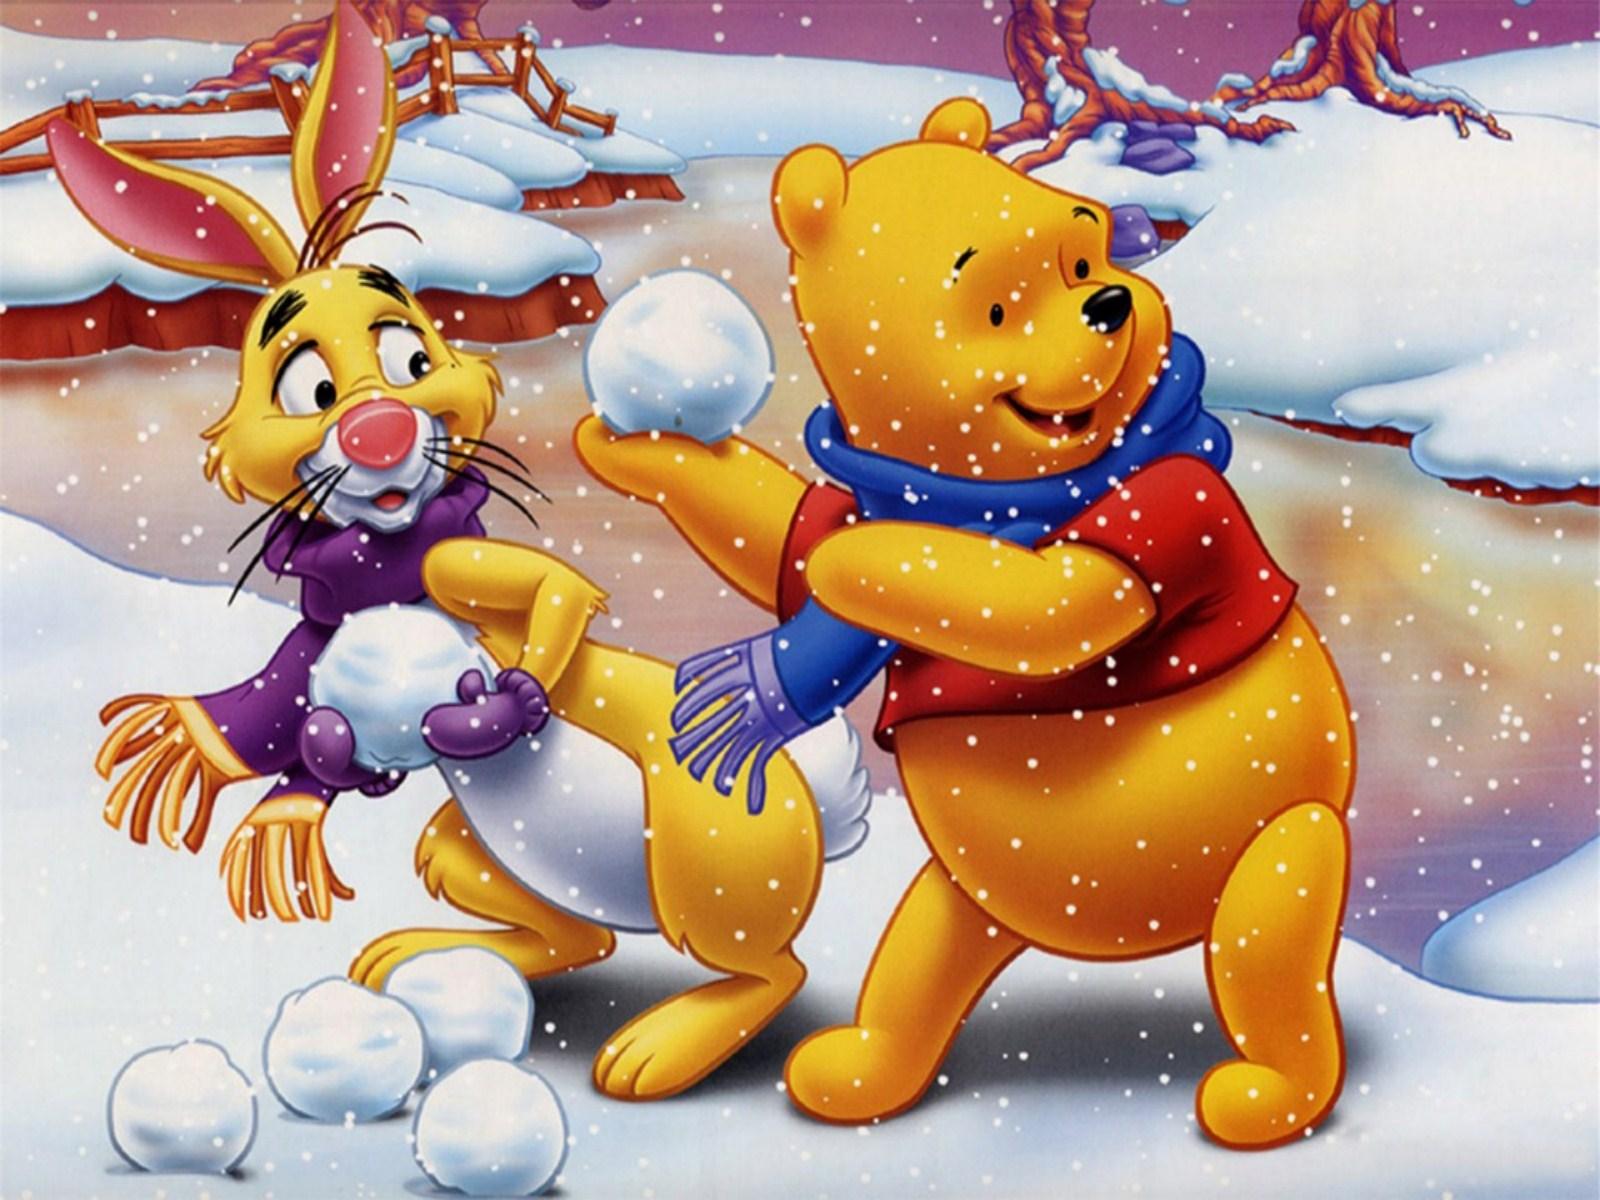 winnie_the_pooh_christmas_desktop_wallpaper-other.jpg